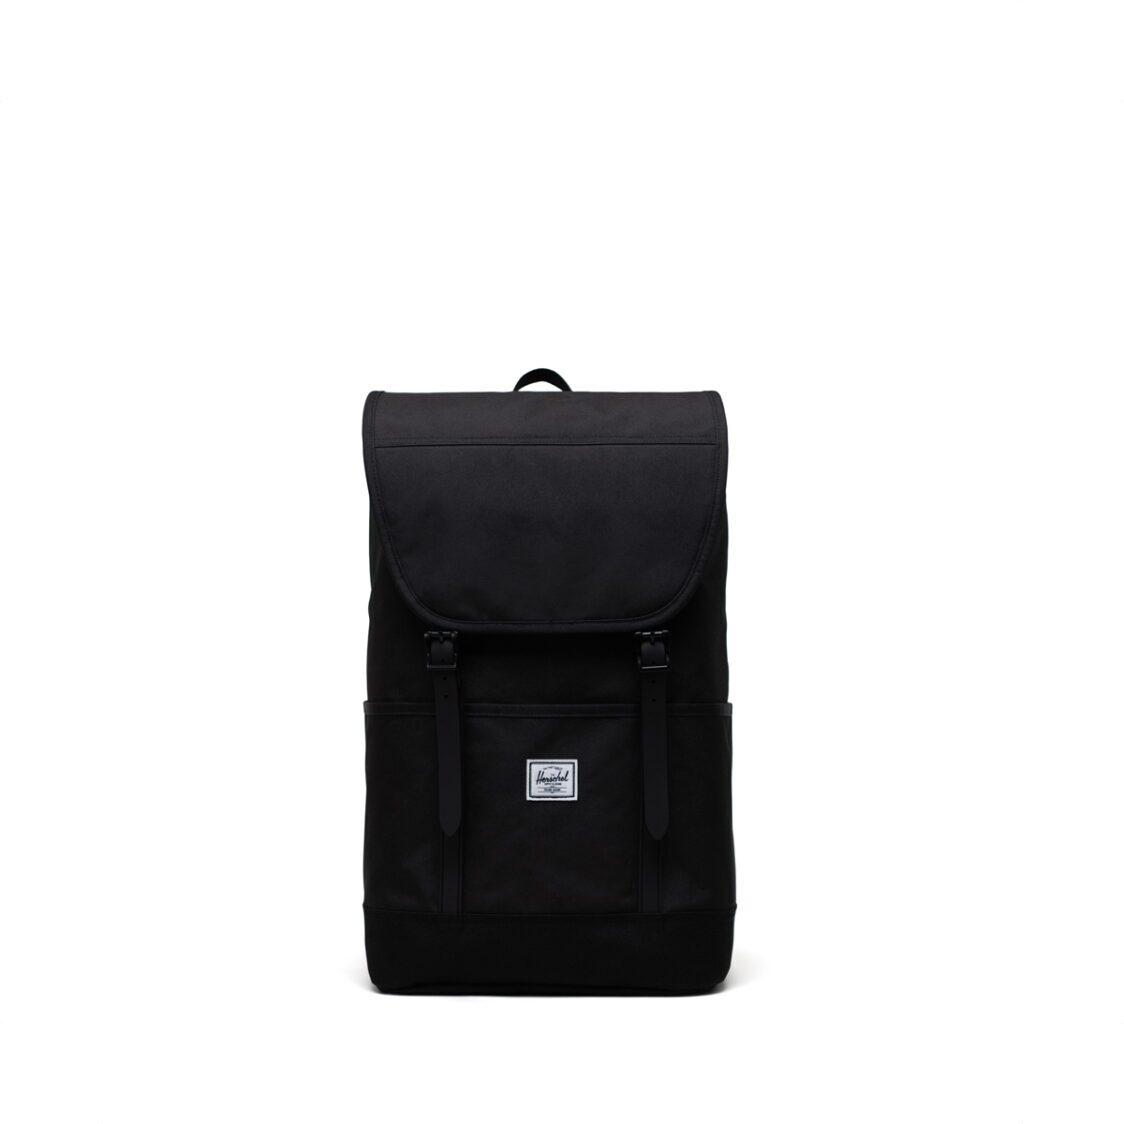 Herschel Retreat Pro Black Backpack 11039-00001-OS